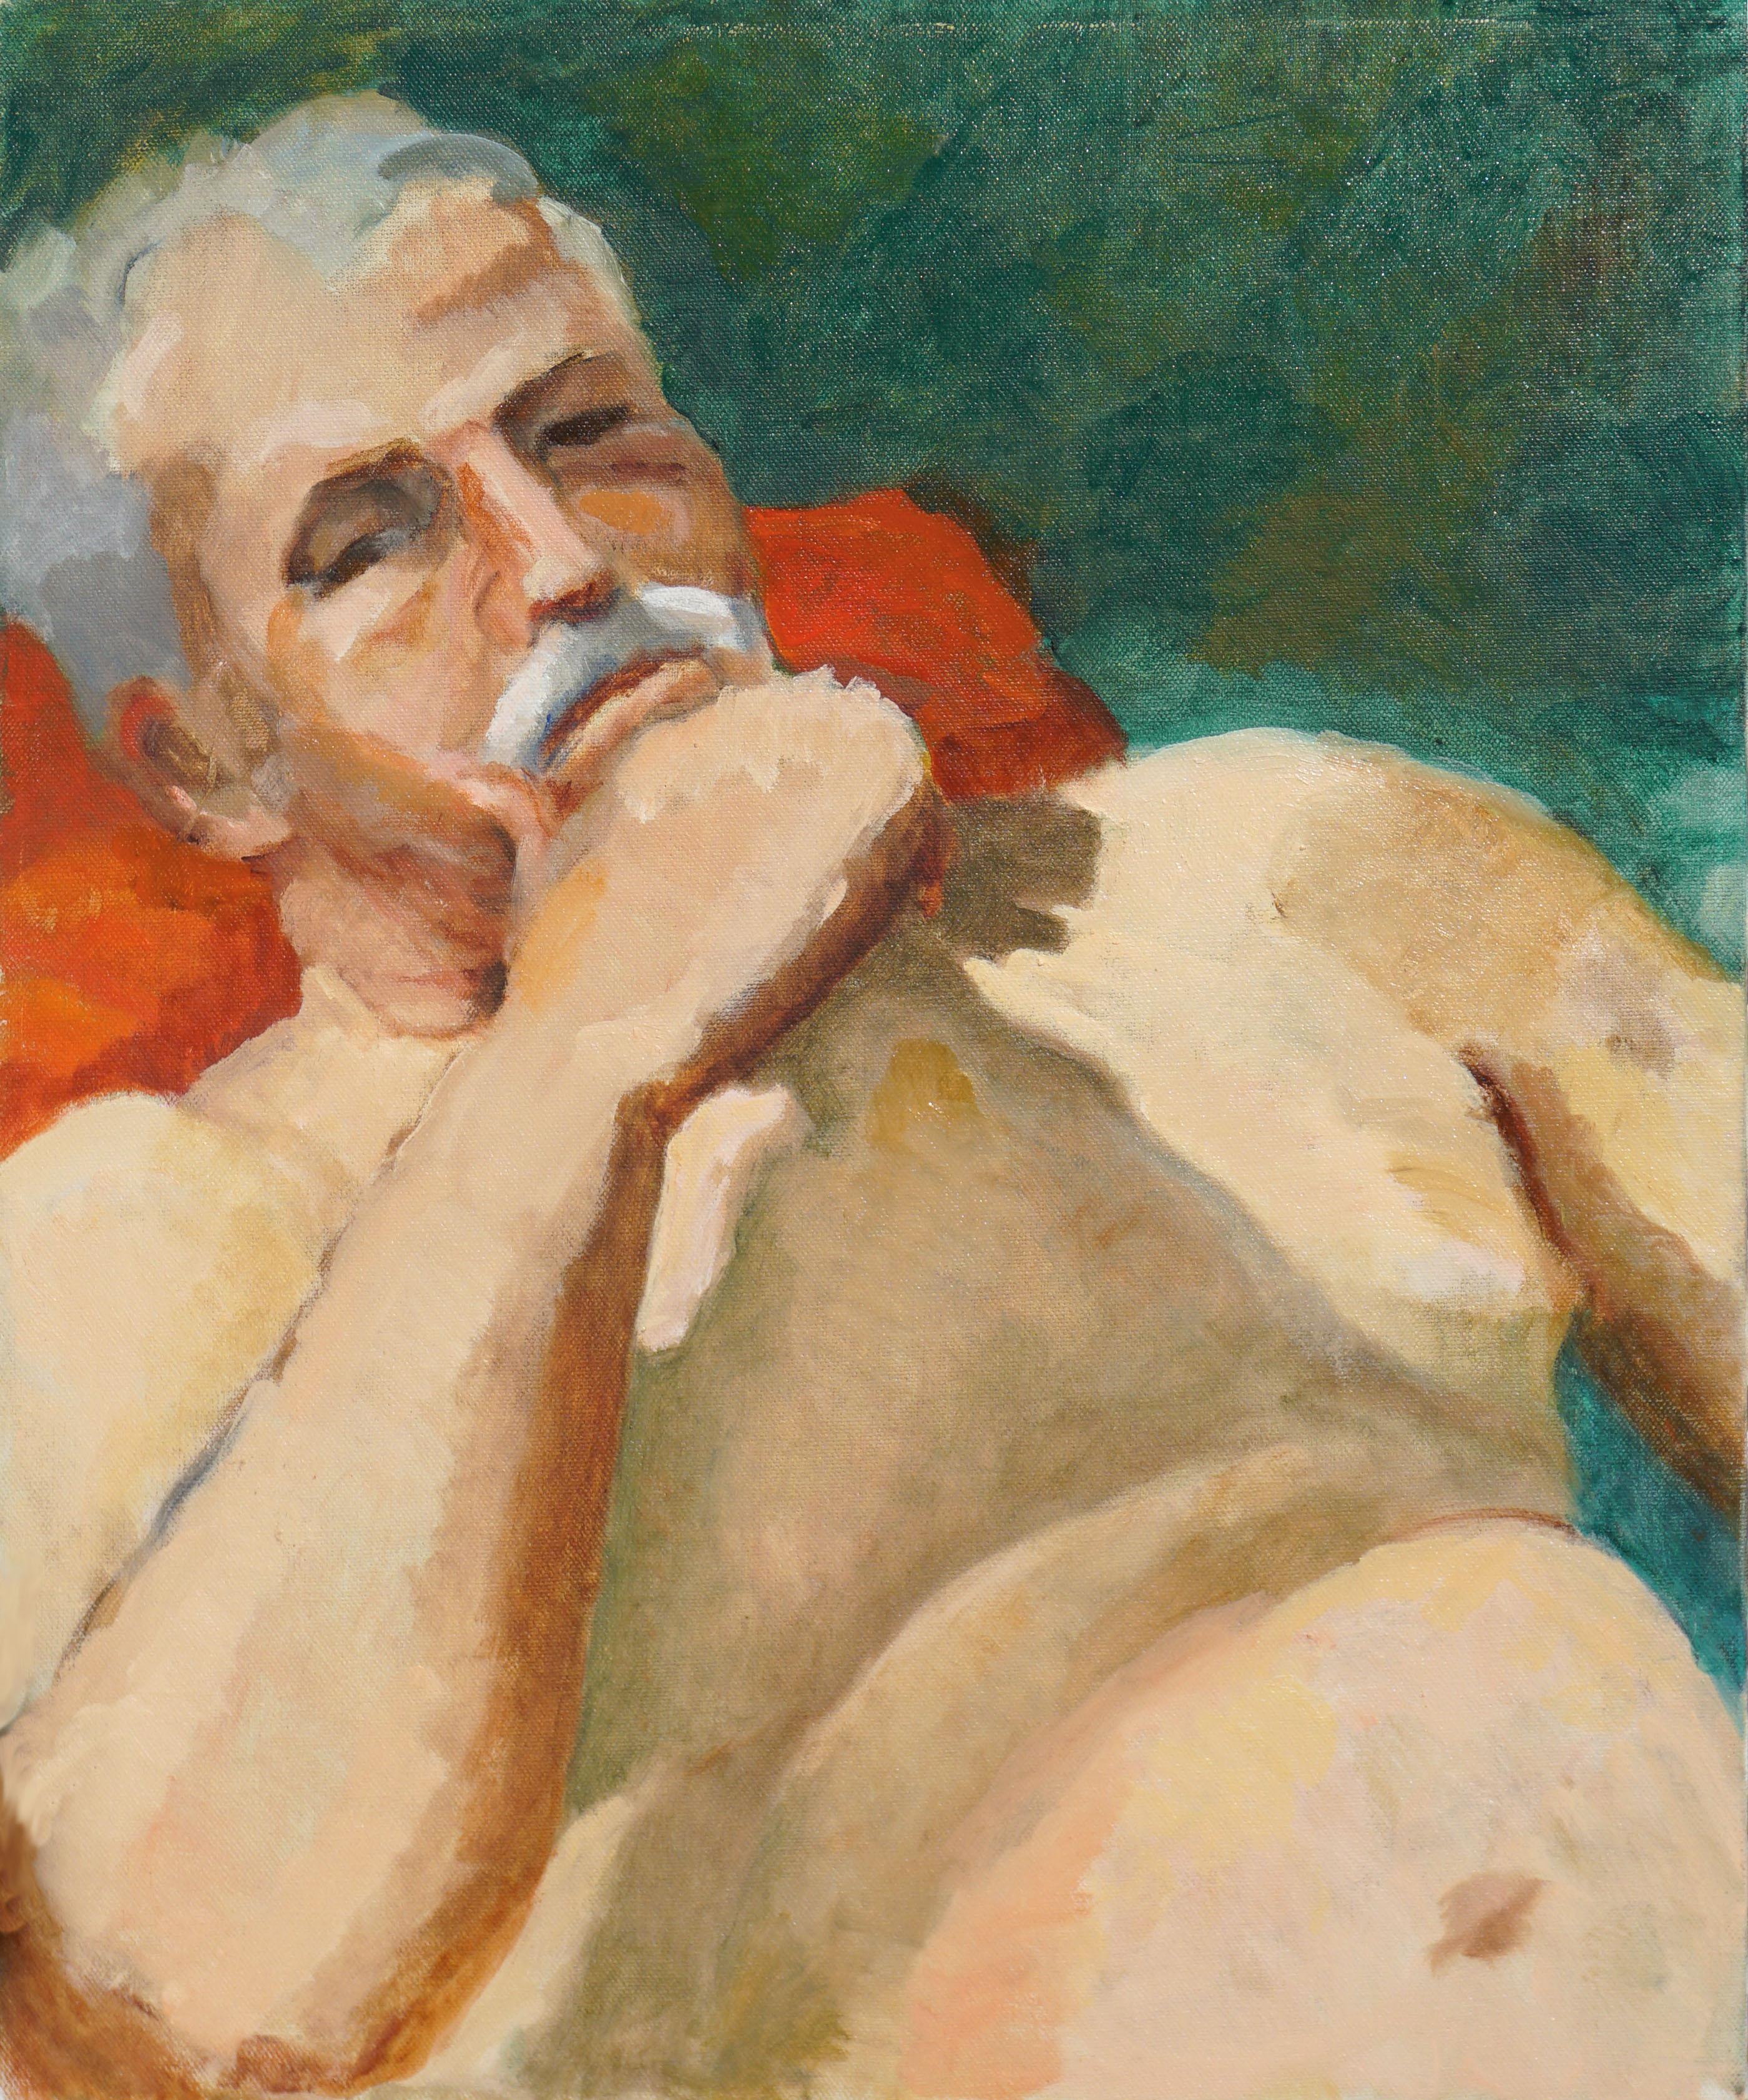 Reclining Male Nude Study